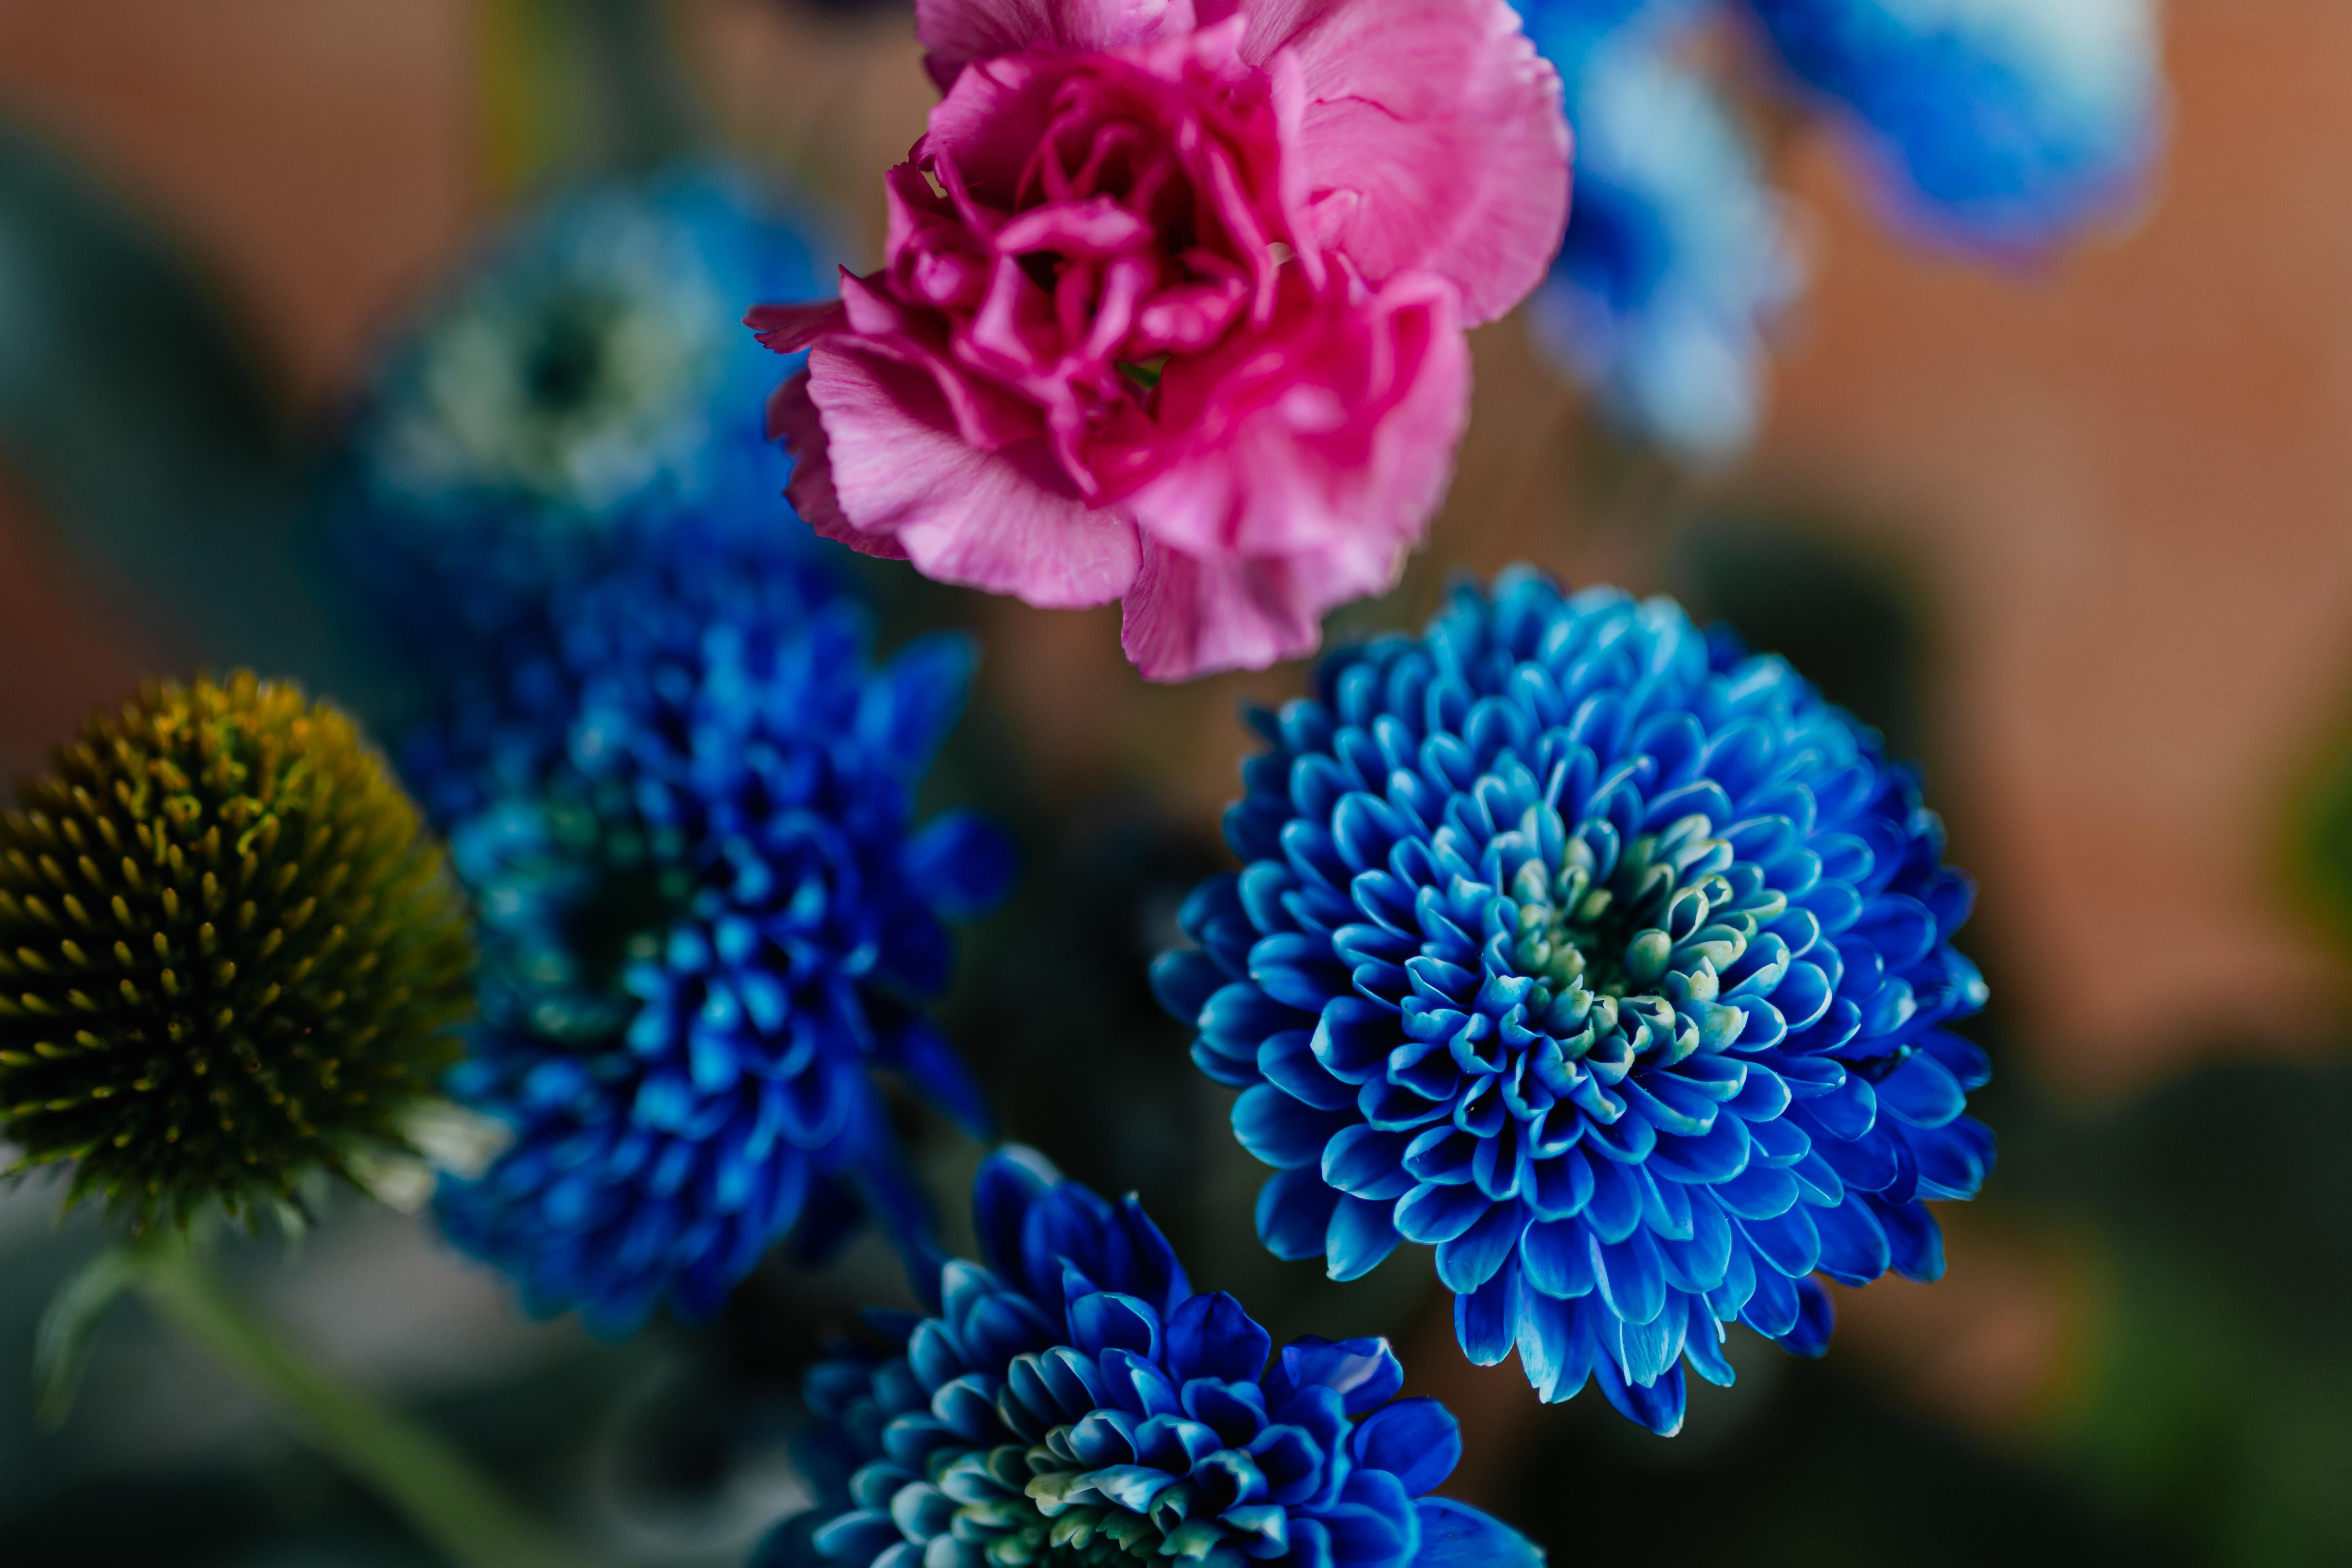 Blue Chrysanthemum morifolium, pink carnation, craspedia globosa, Echinacea, Phlebodium